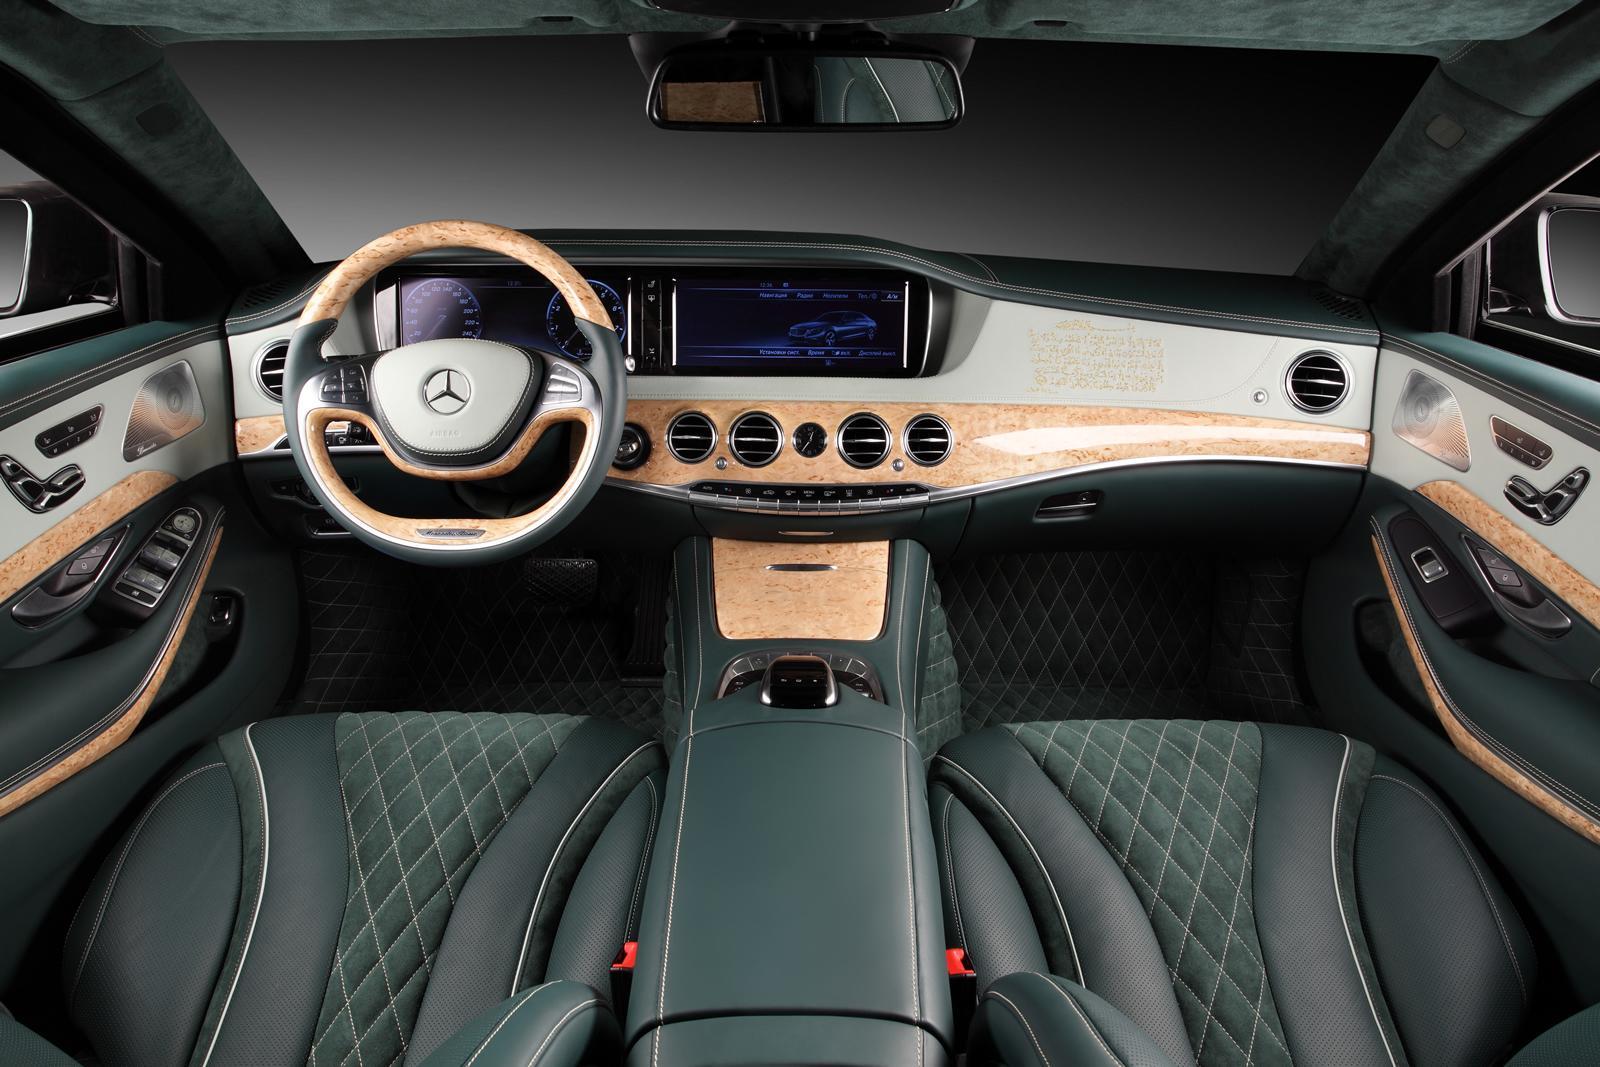 2016 BRABUS 900 Mercedes-Maybach S600 - Interior | HD Wallpaper #6